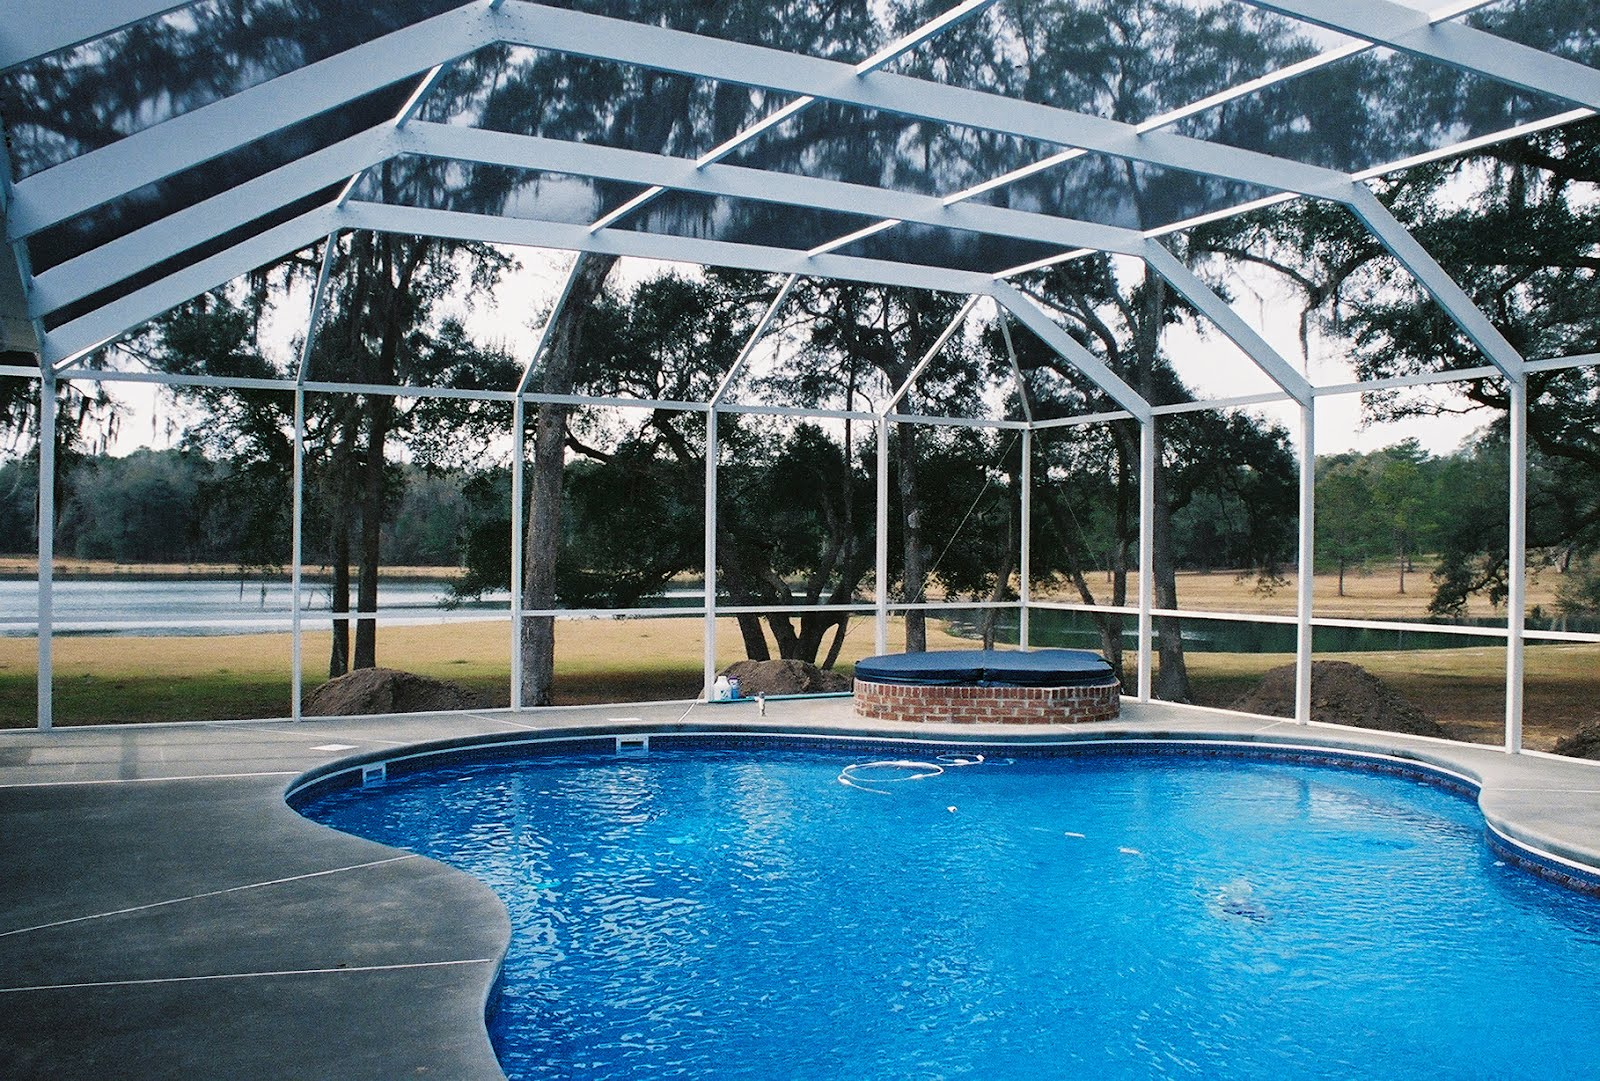 Pool enclosures usa perry florida pool enclosures for Pool enclosures houston